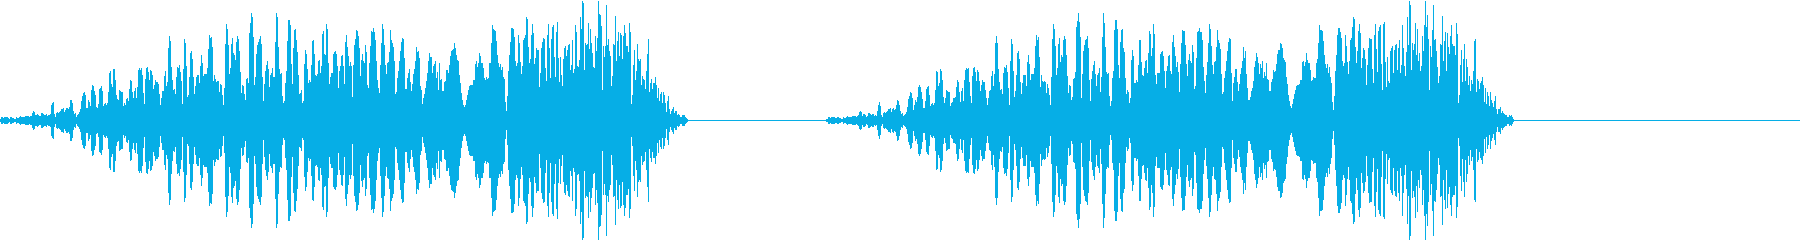 DJプレイ スクラッチ・ノイズ 174の再生済みの波形